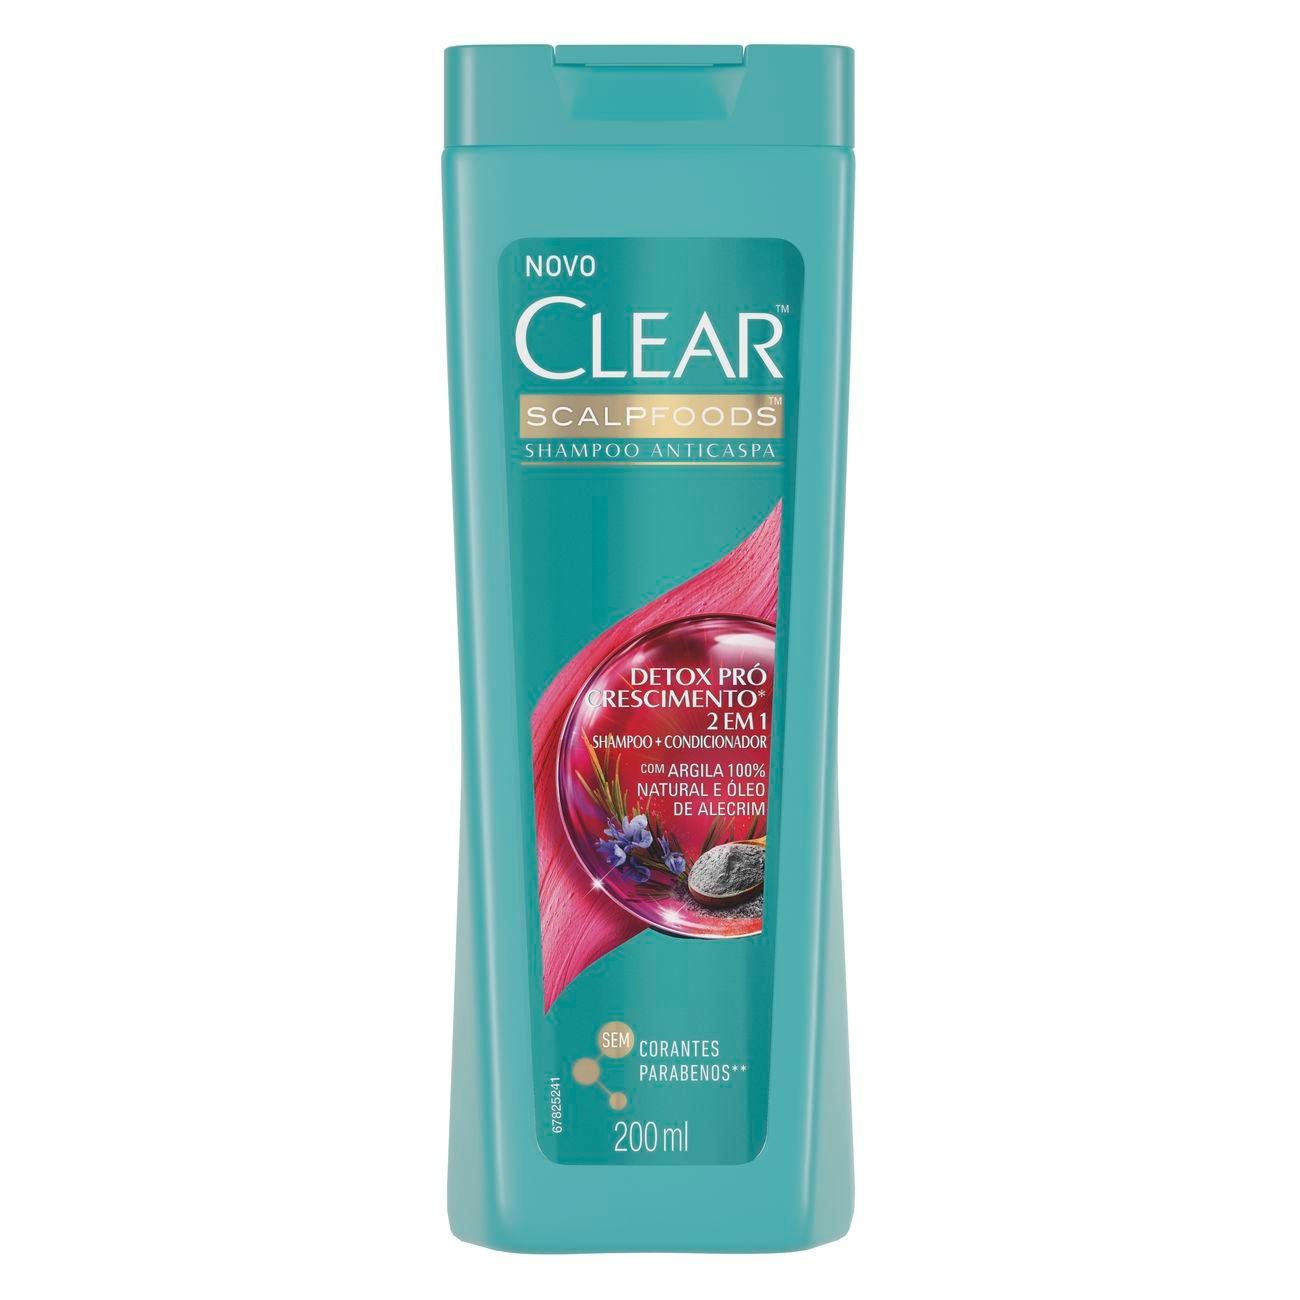 SH CLEAR 2EM1 DETOX PRO CRES 1X200ML (12